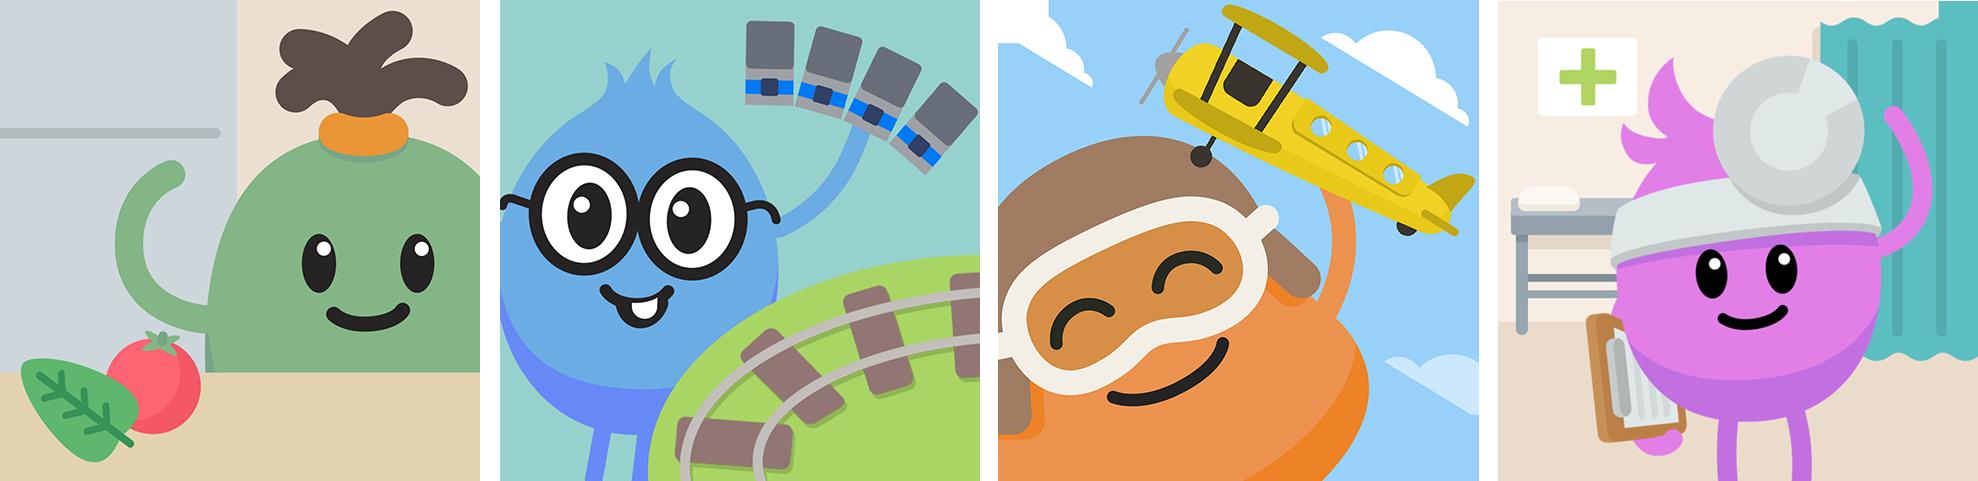 App Icons (left to right): Boffo's Breakfast, Loopy's Trainset, Madcap's Plane, Zany's Hospital